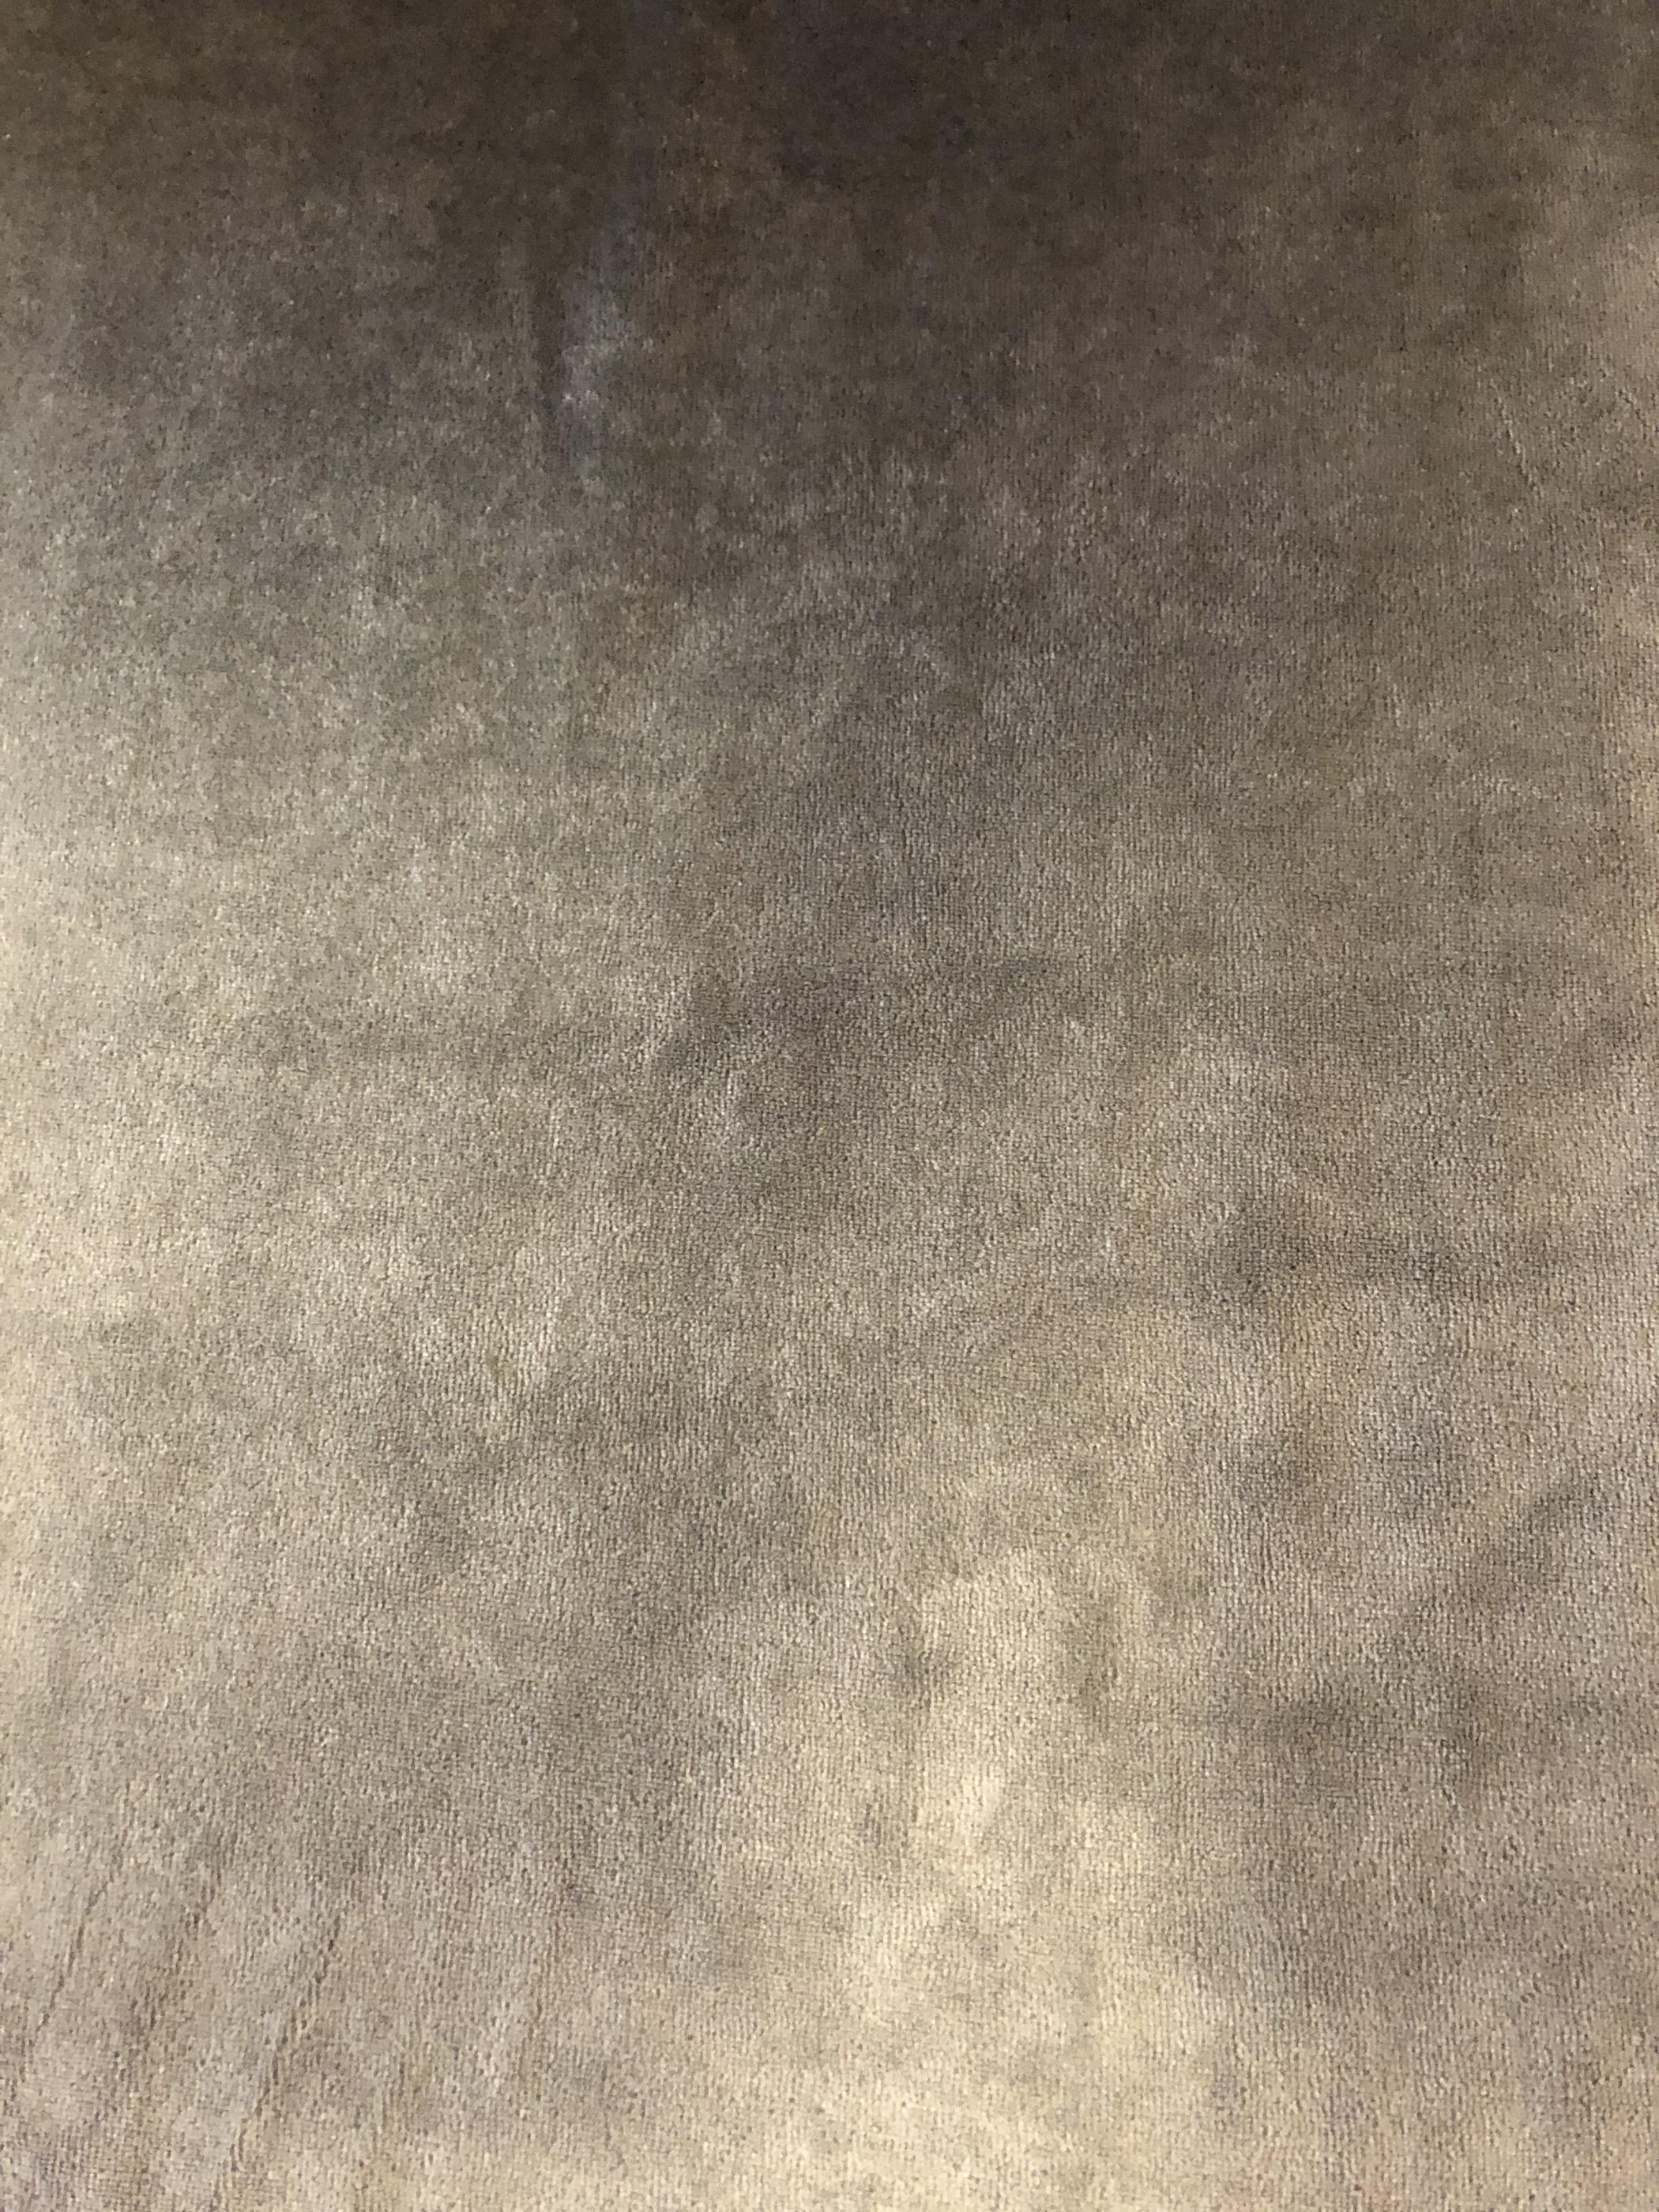 grå stretch velour stretchvelour laholm tyglust metervara modetyg